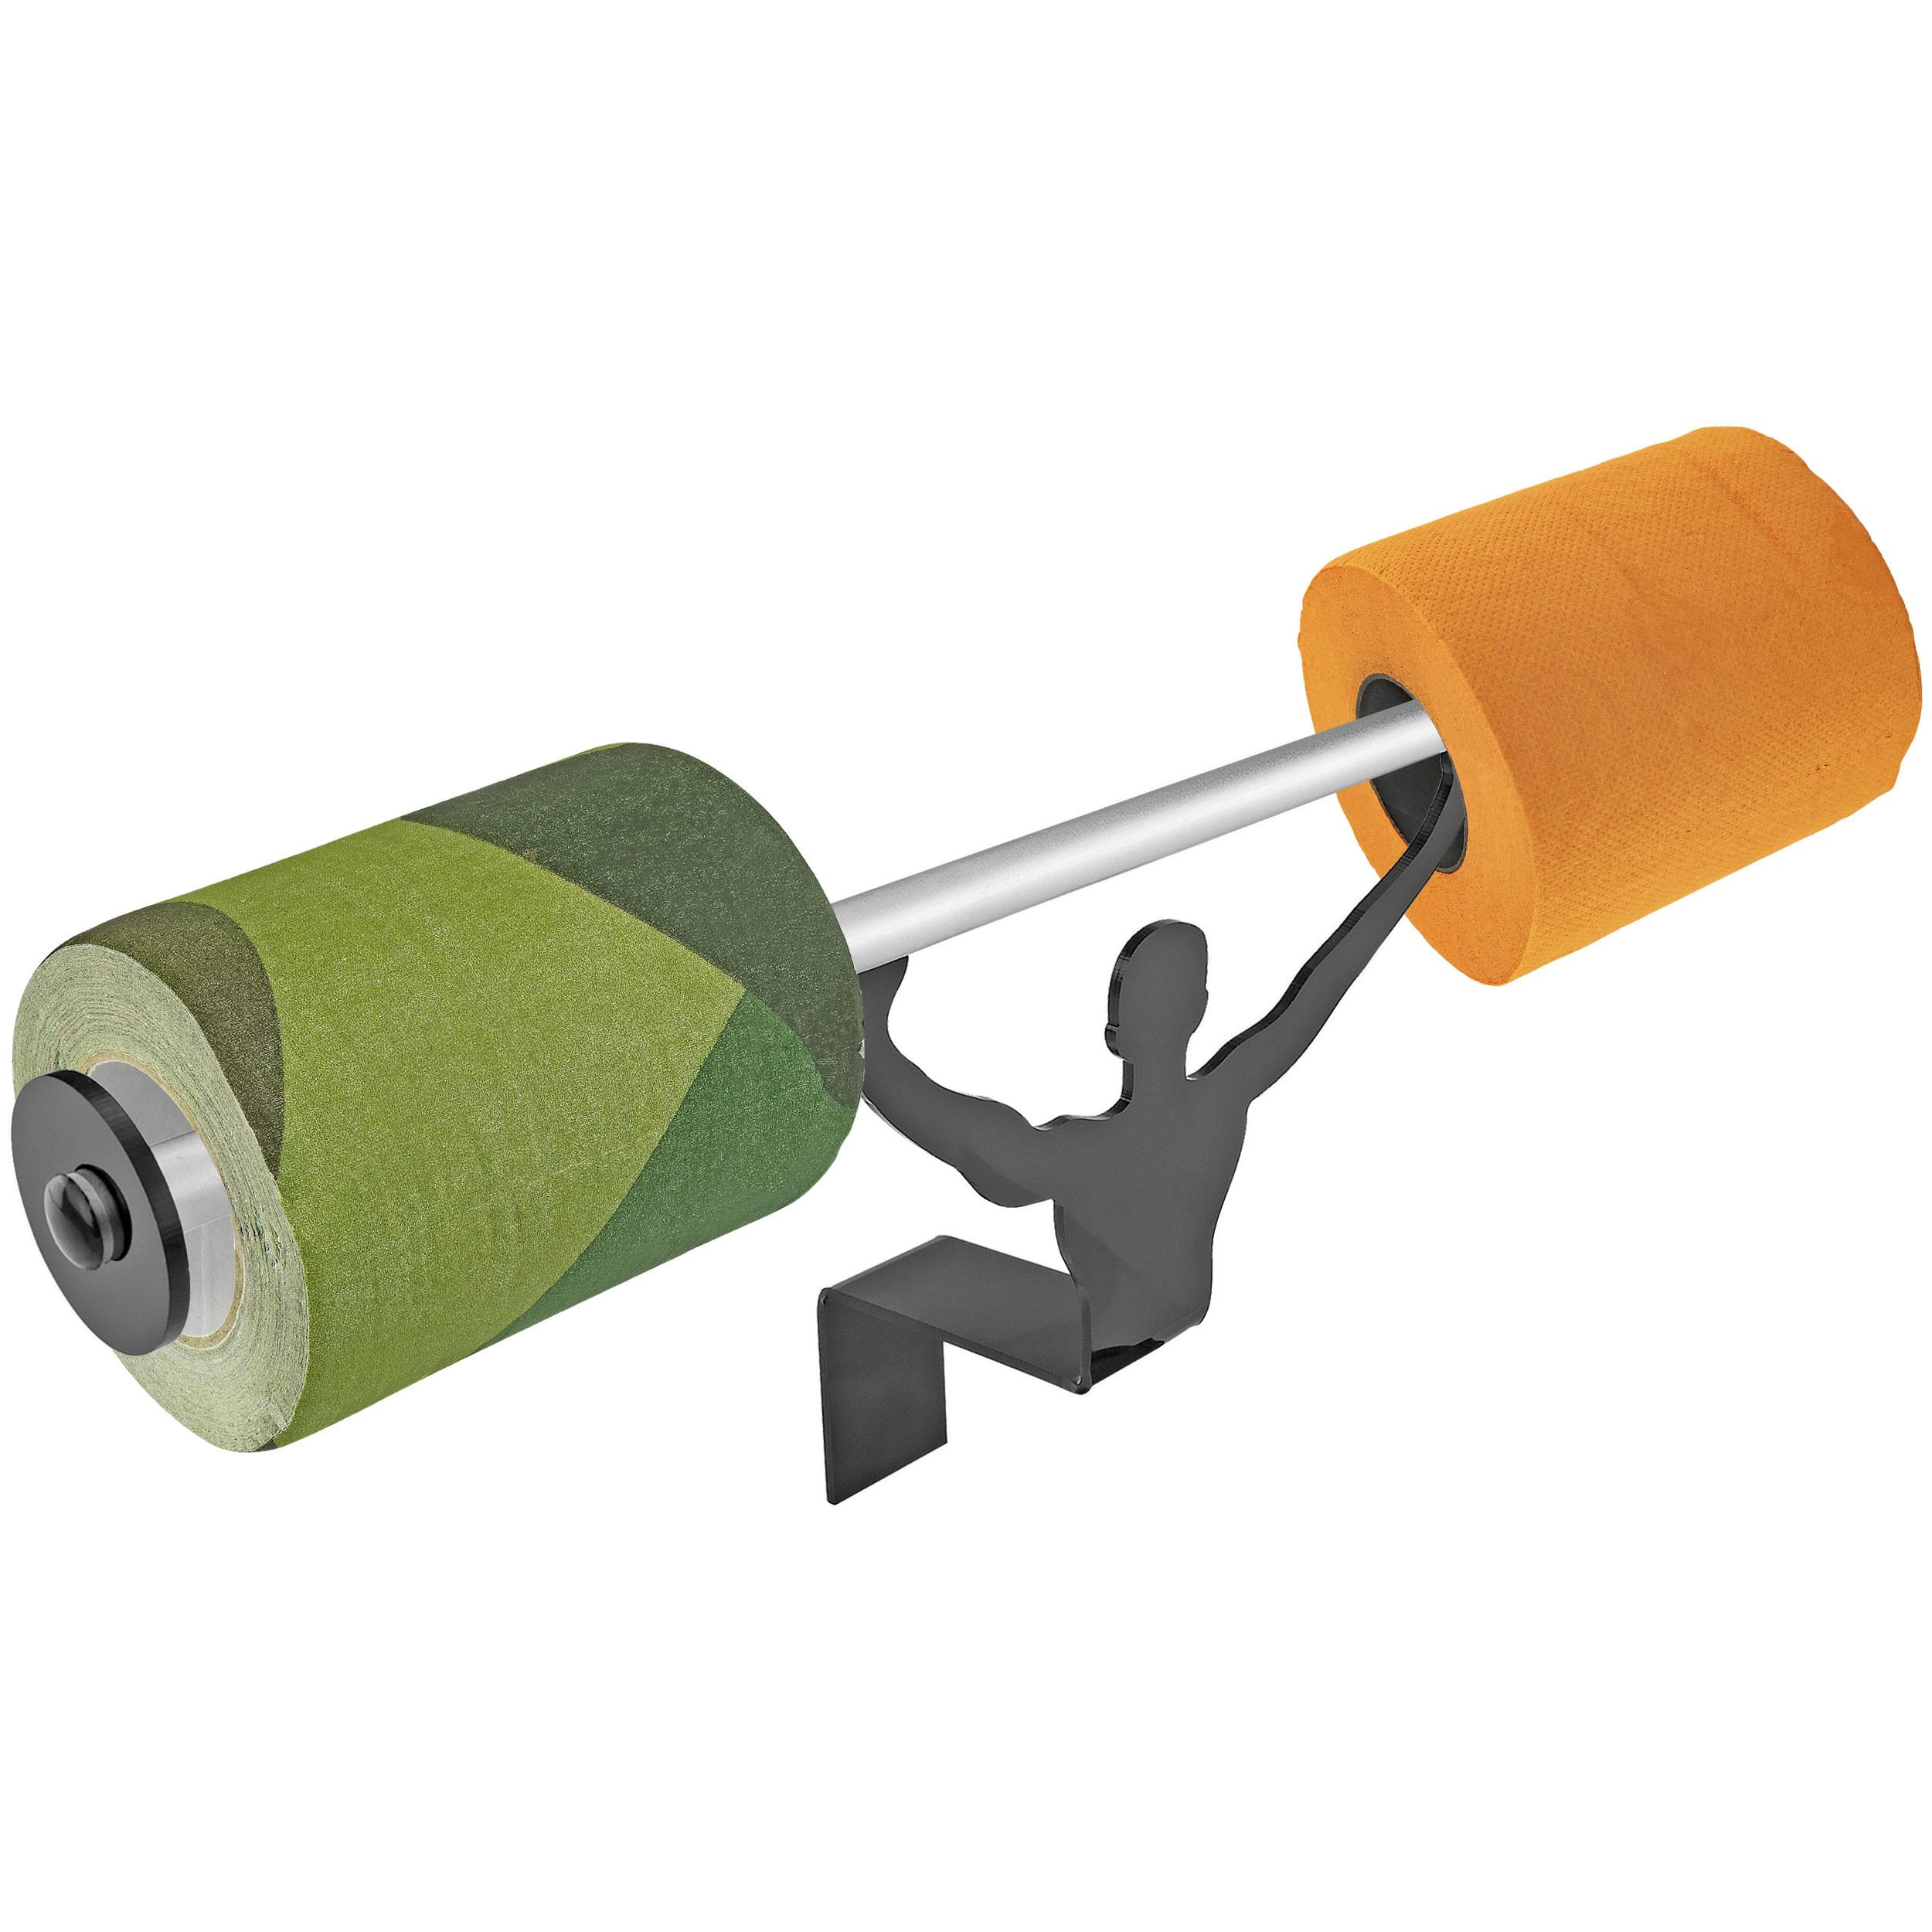 Fairly Odd Novelties FON-10153 Camo & Blaze Toilet Paper W/Strong Man Holder Hunter Gift Set, Camo/Blaze Orange